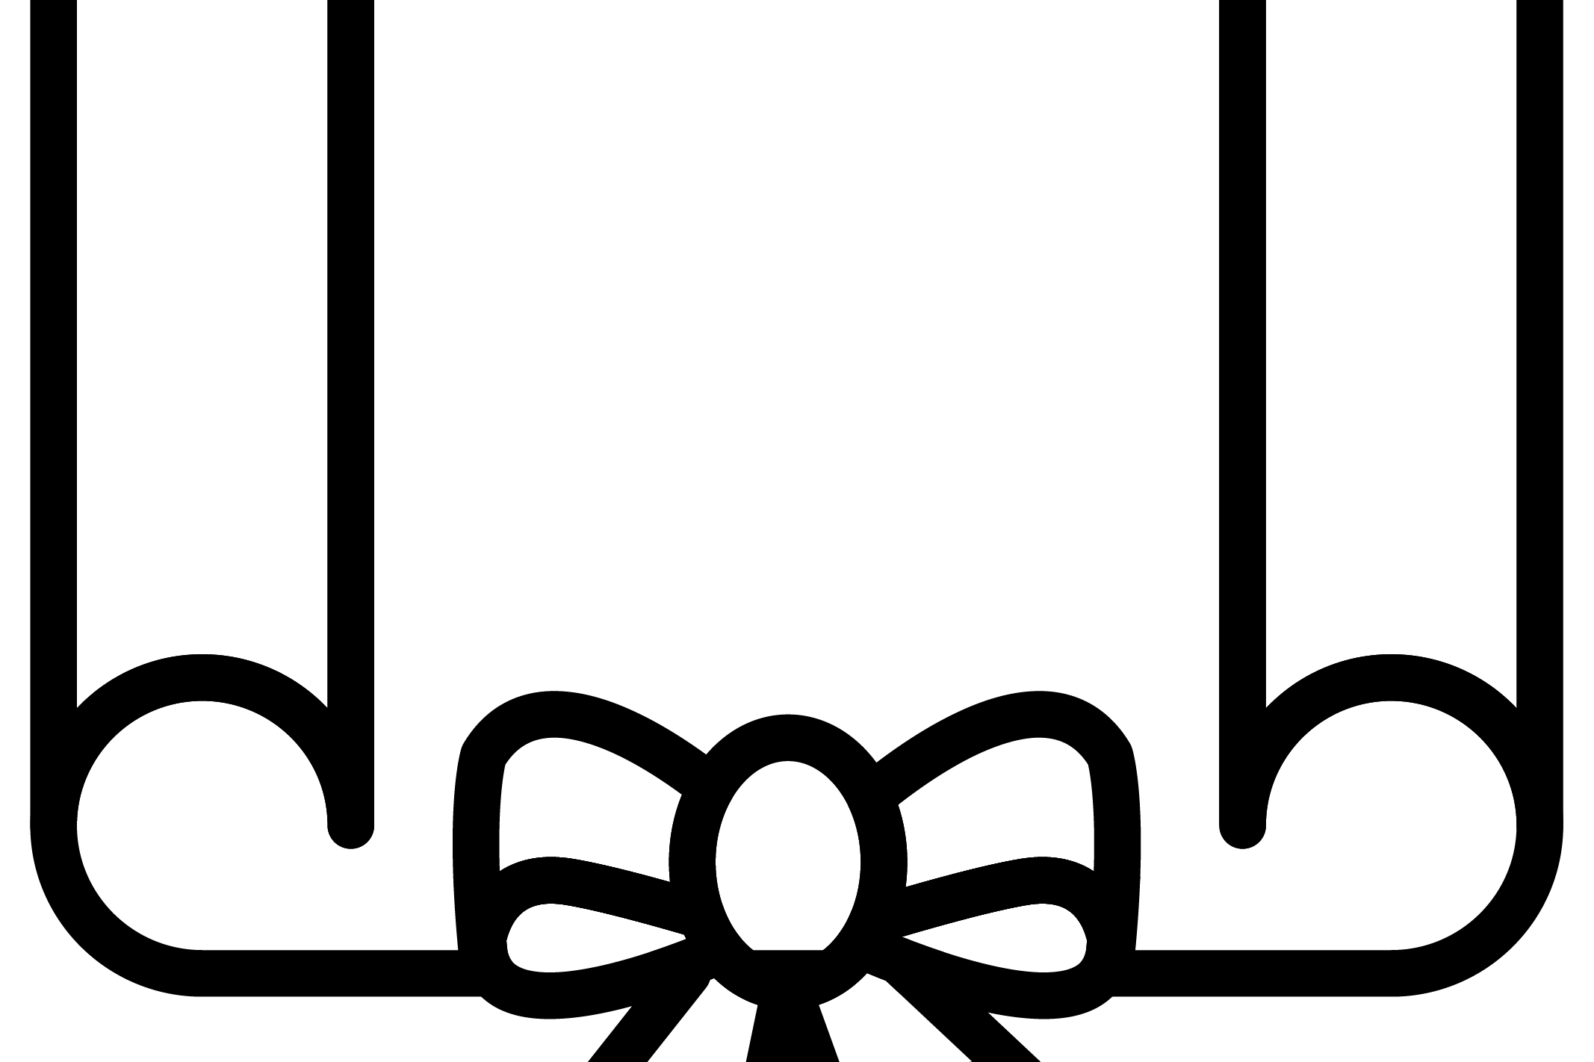 Outline : Scrolls Icon set - flawe 01 -